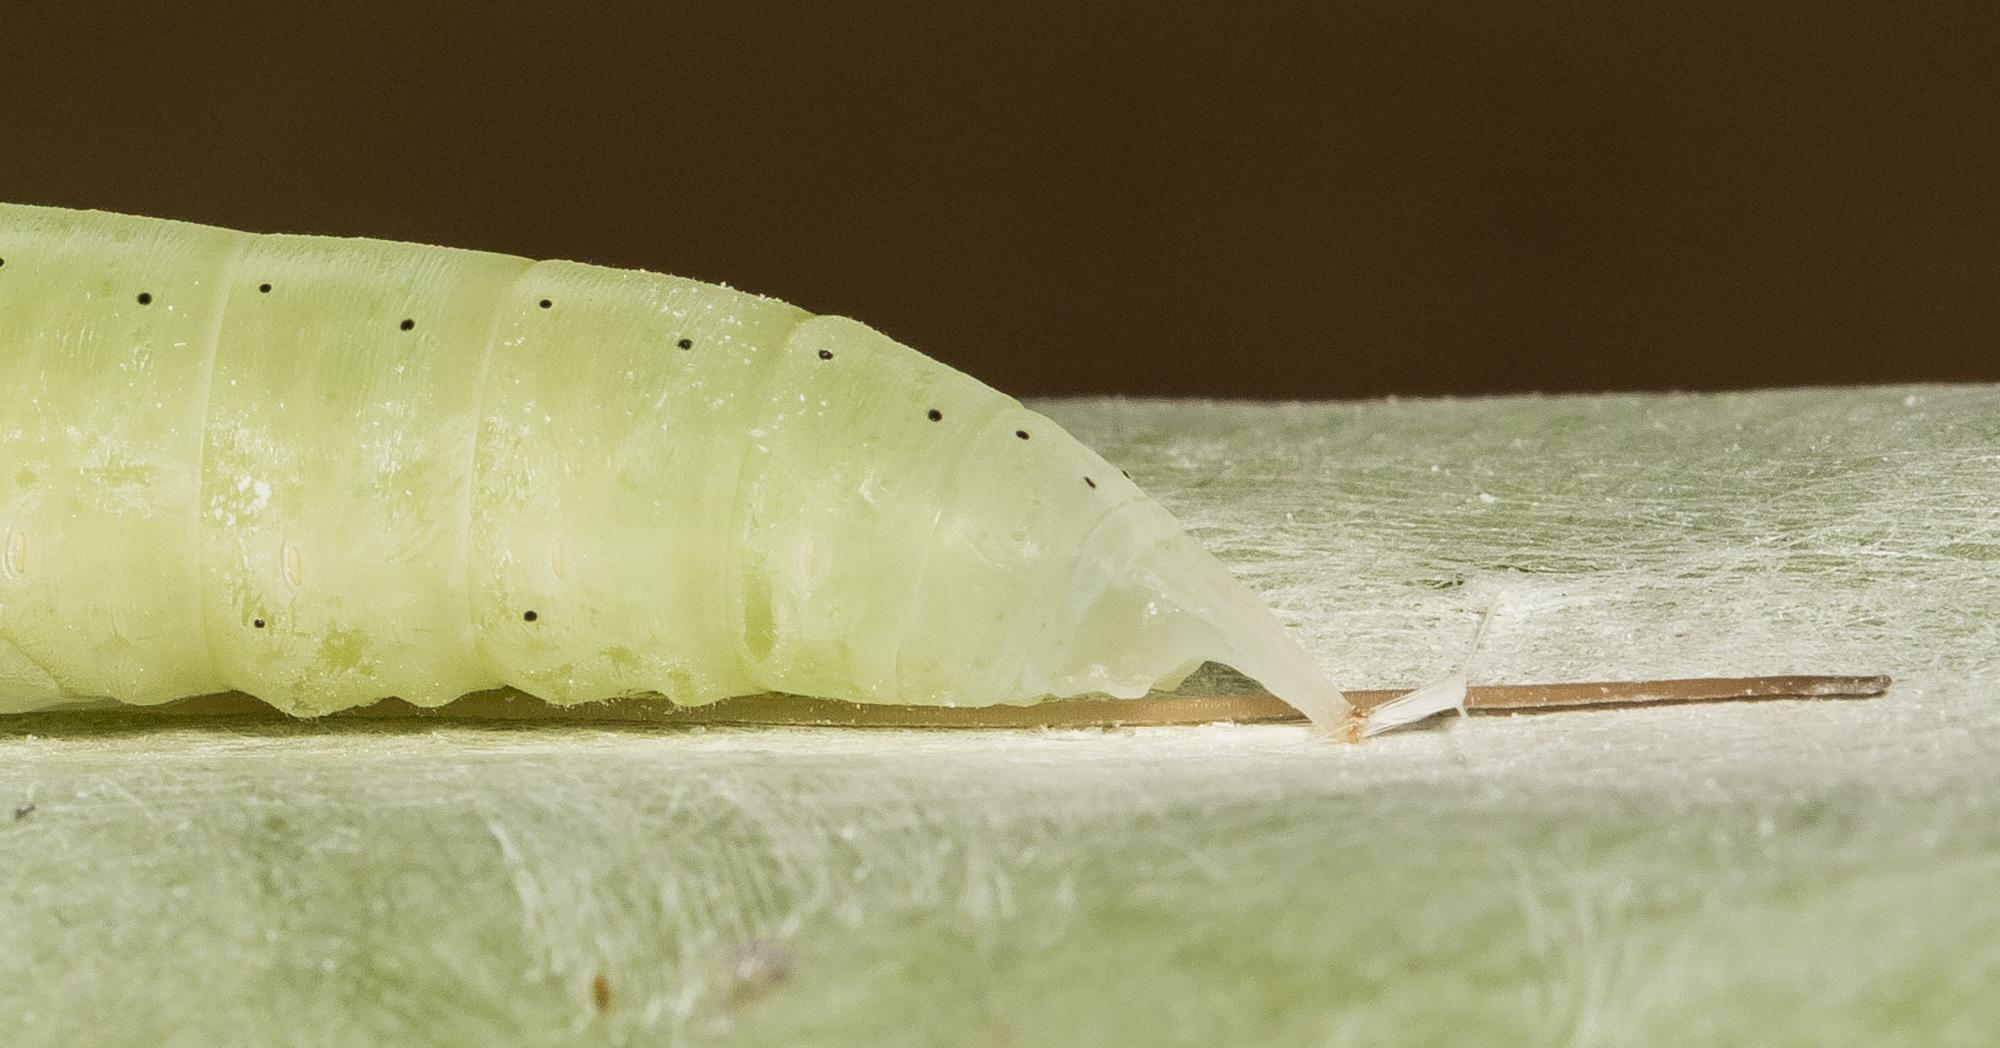 Brazilian skipper chrysalis close up of tail region